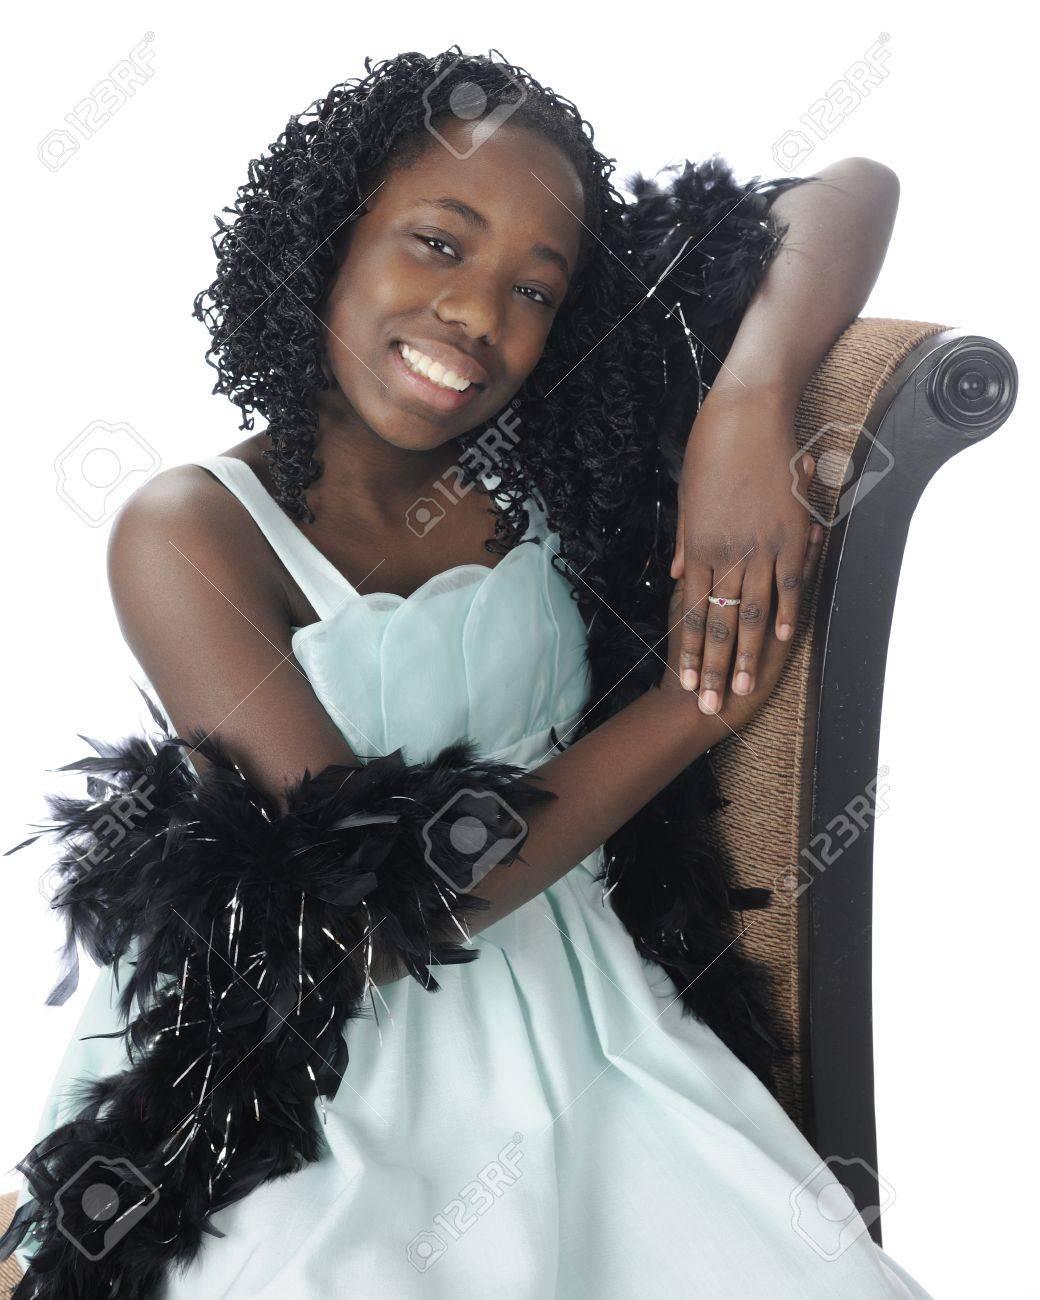 black preteen